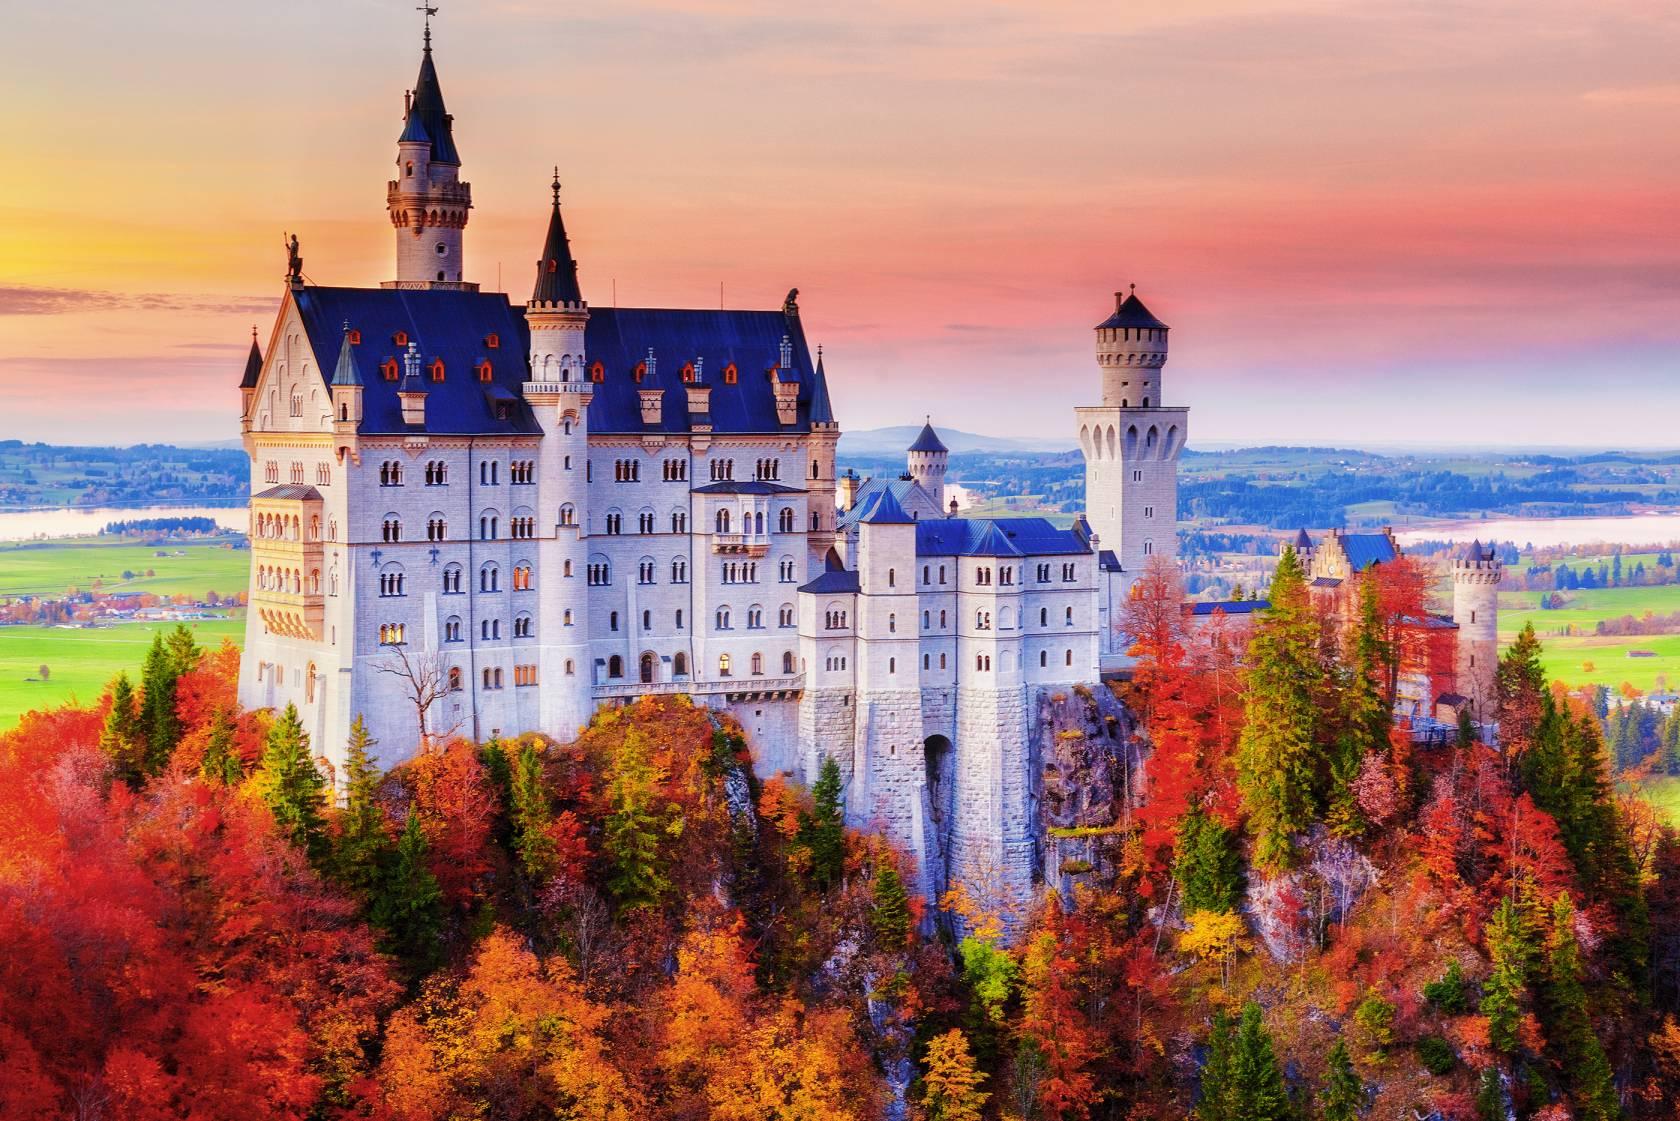 TOP 10 ドイツ名所ランキング 2019年度(一覧)〜ドイツの観光名所第1 ...